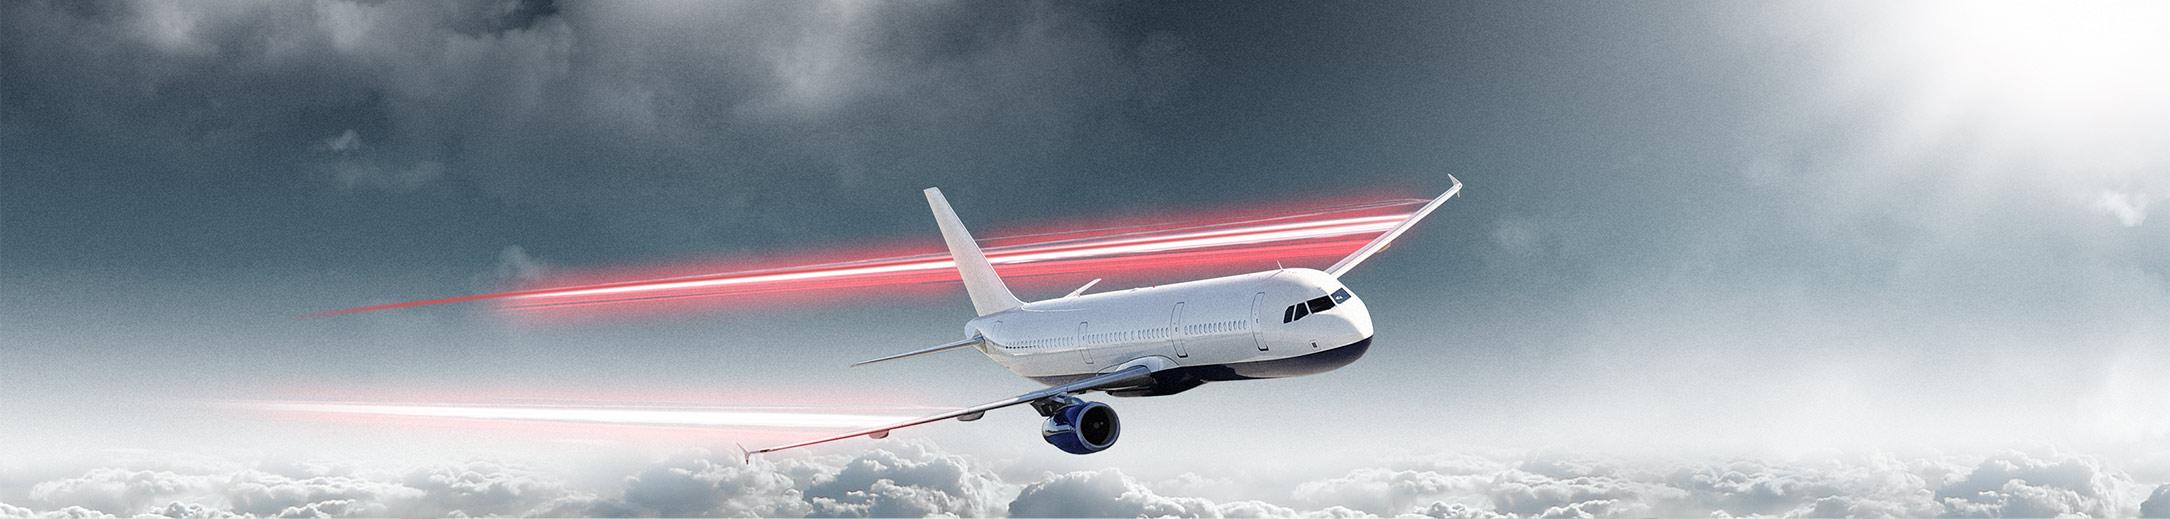 Systra Logistik - Transporte aéreo